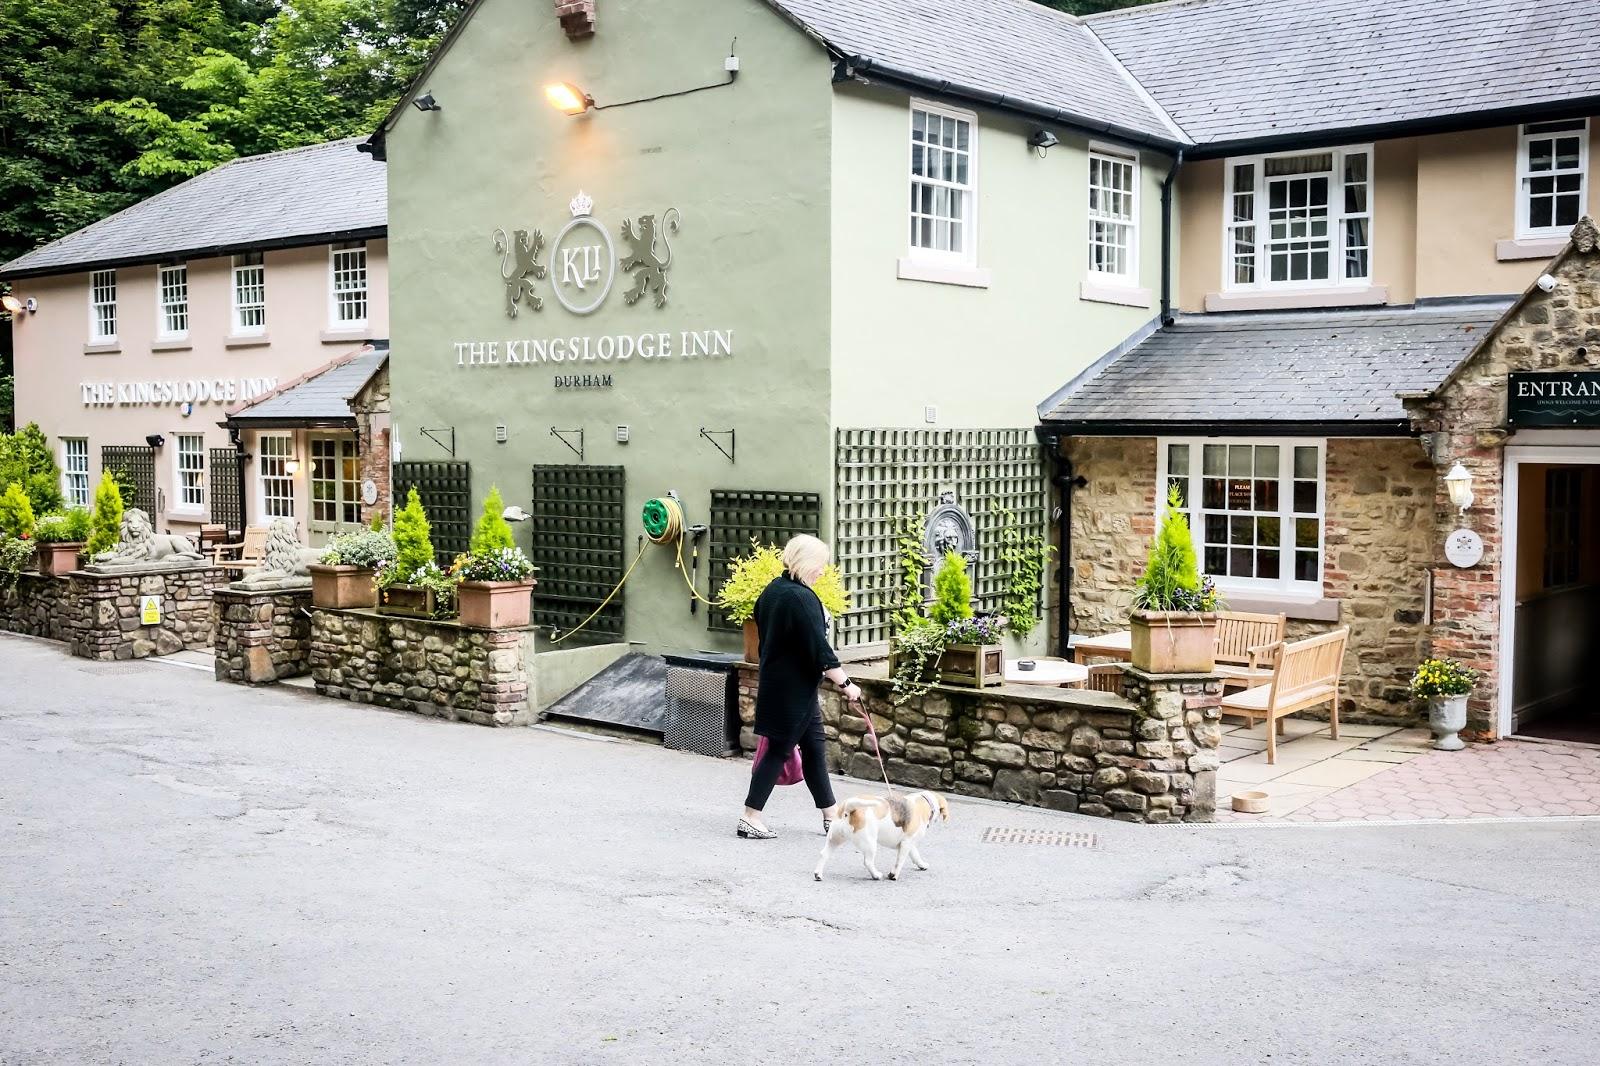 The Kingslodge Inn Durham A Great Dog Friendly Pub Mandy